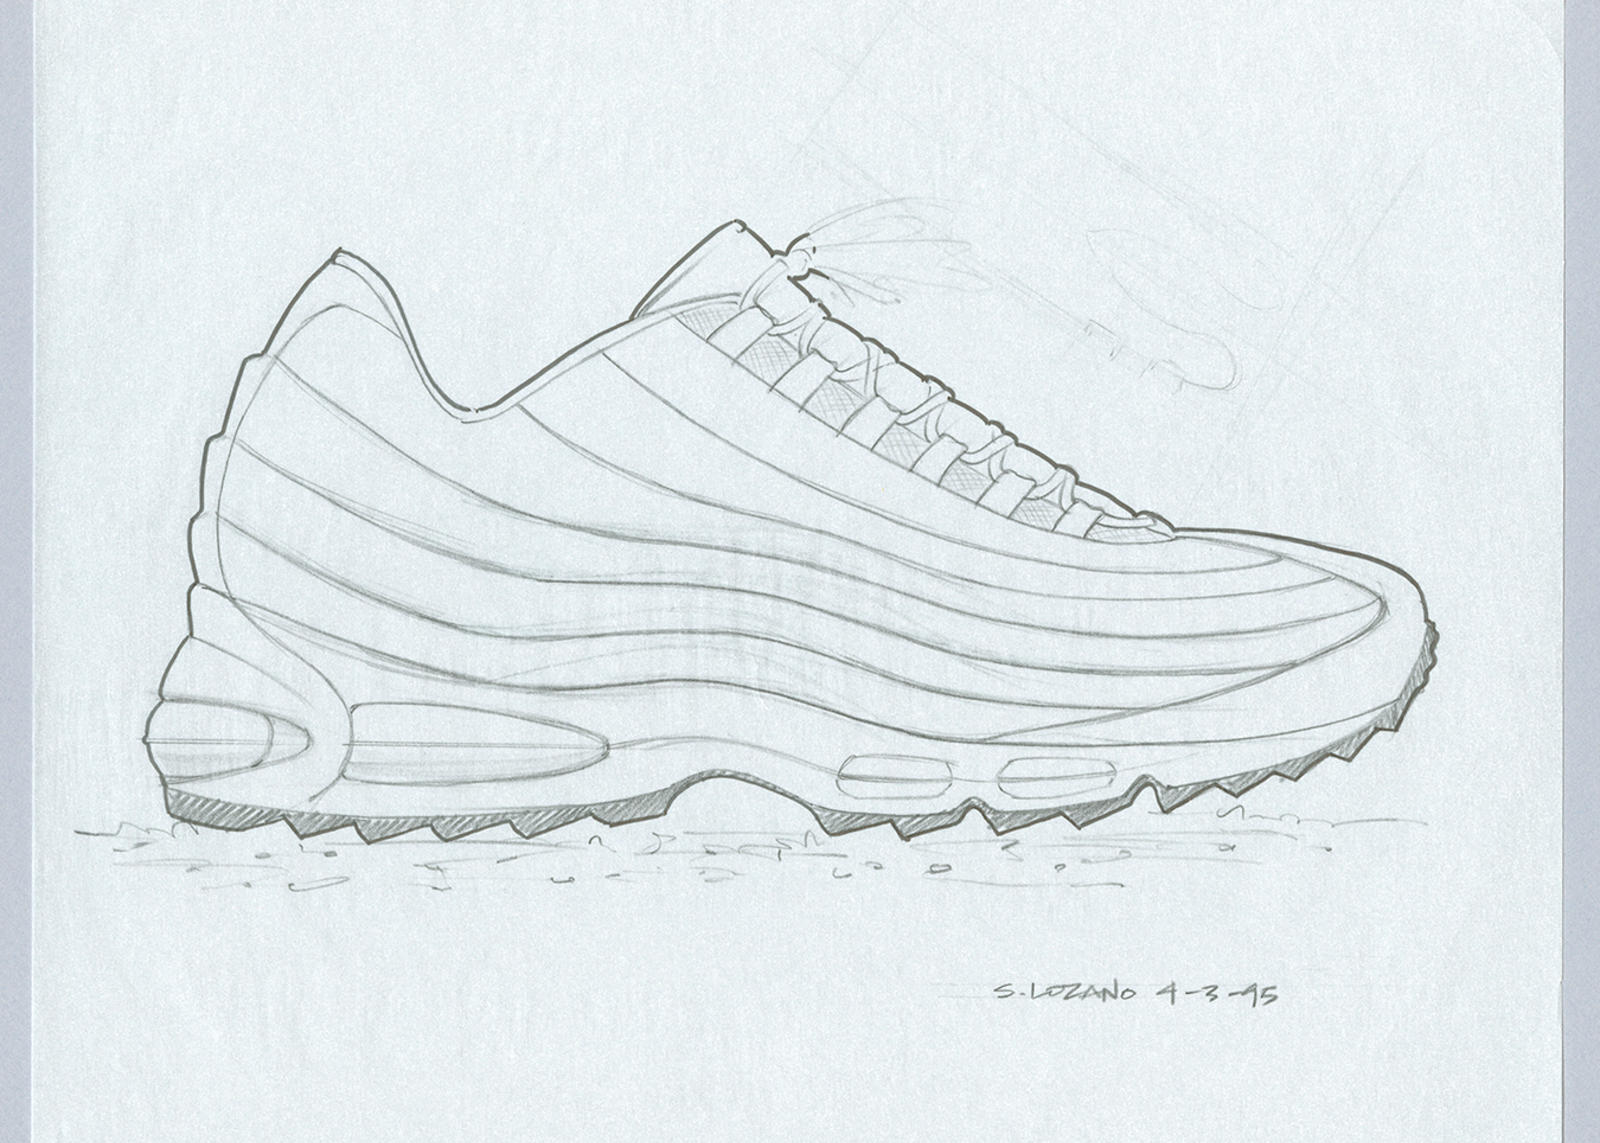 <b>Nike Air Max 95</b> — 20 главных фактов о культовых кроссовках